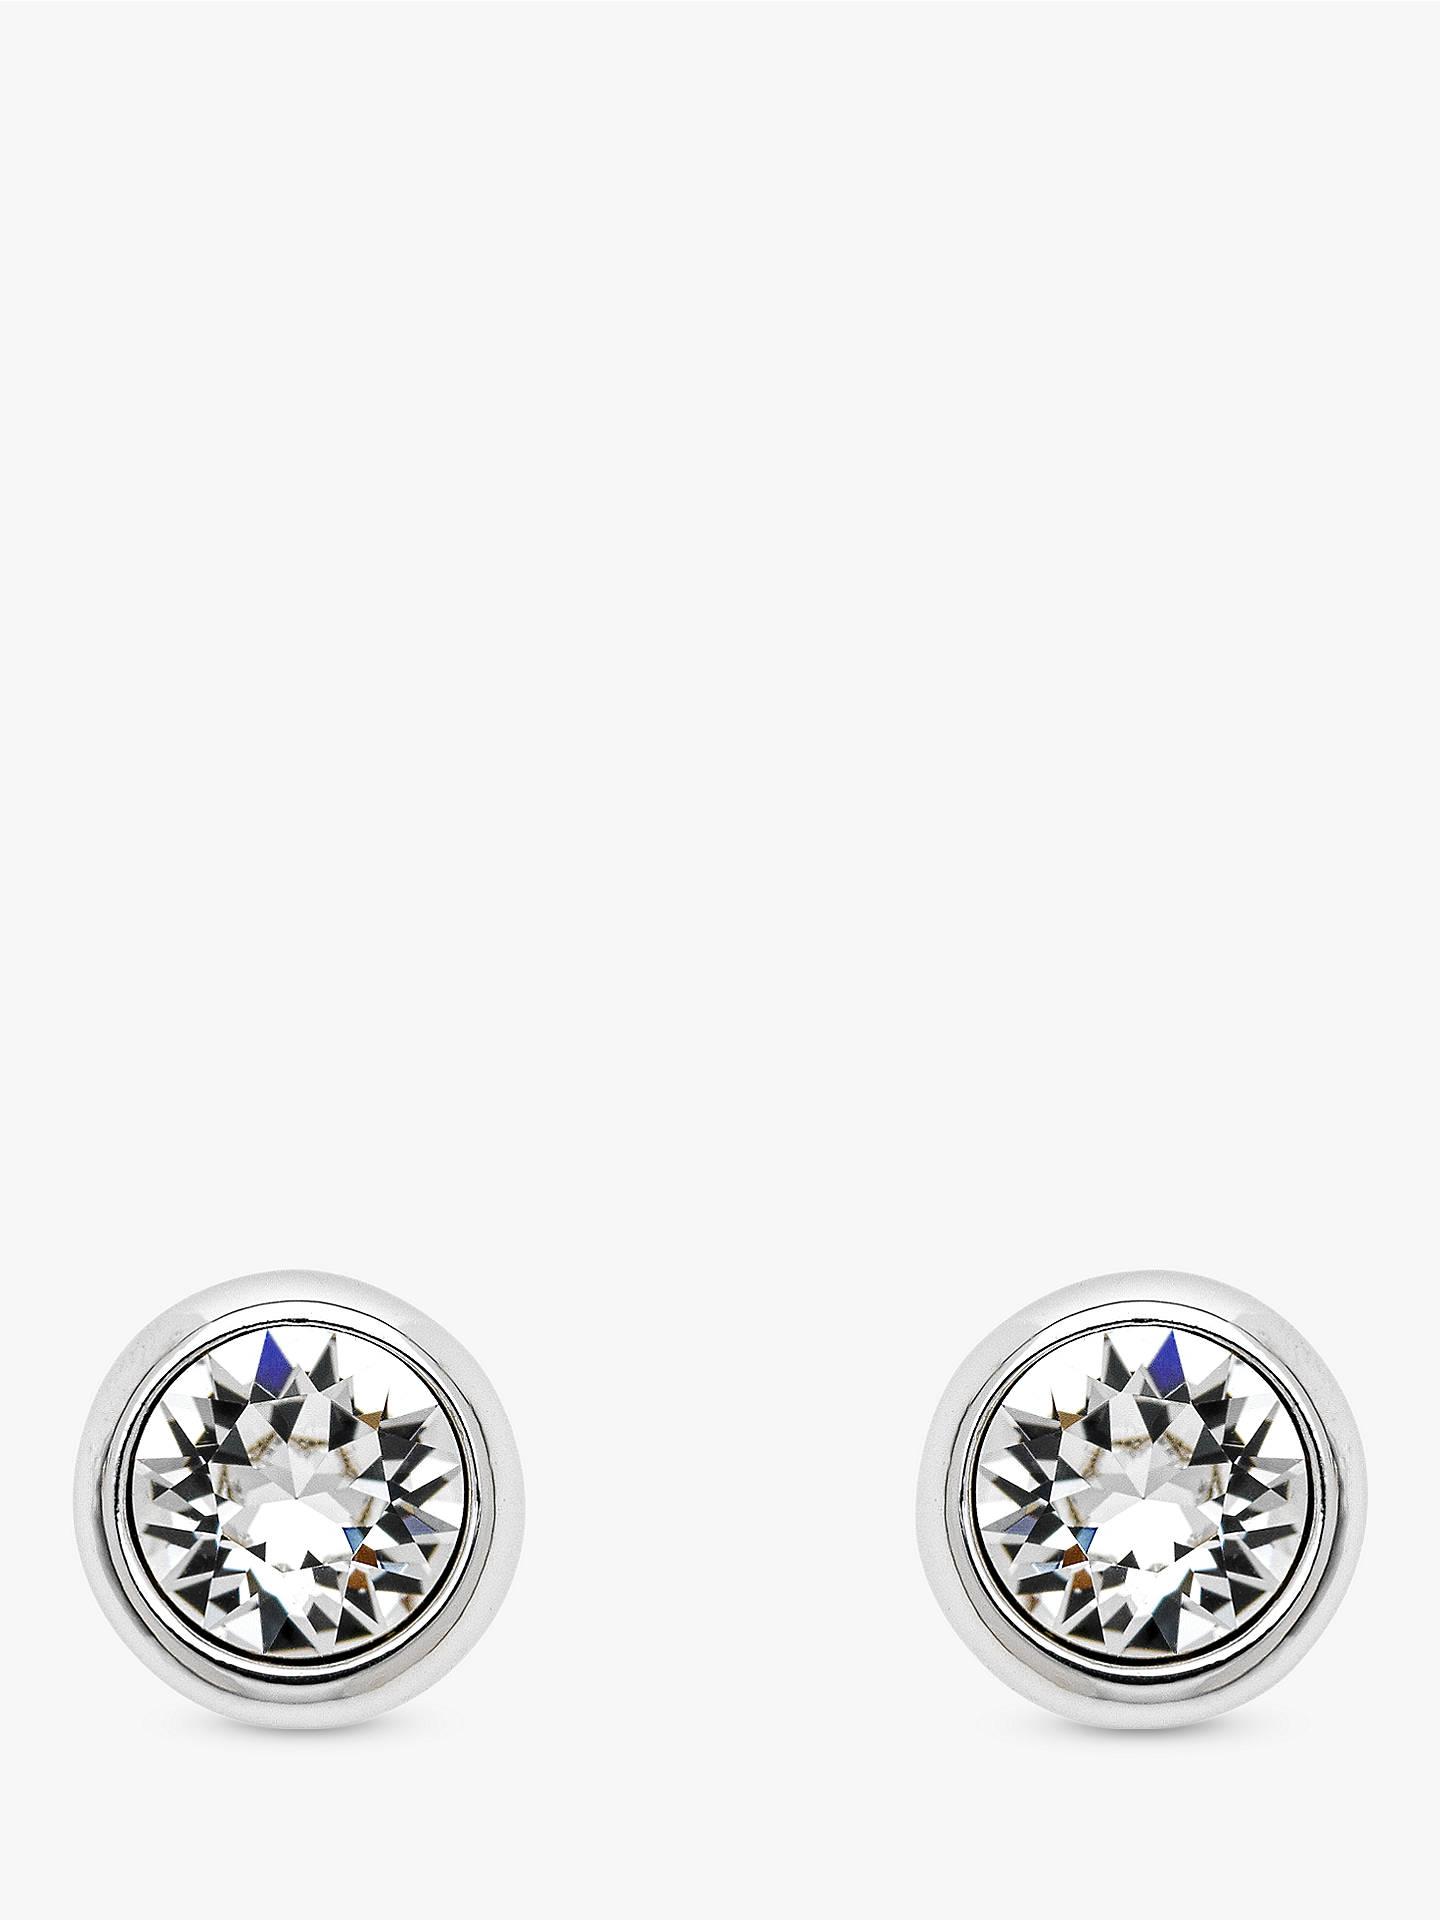 1379dd346 Buy Melissa Odabash Swarovski Crystal Round Stud Earrings, Silver Online at  johnlewis.com